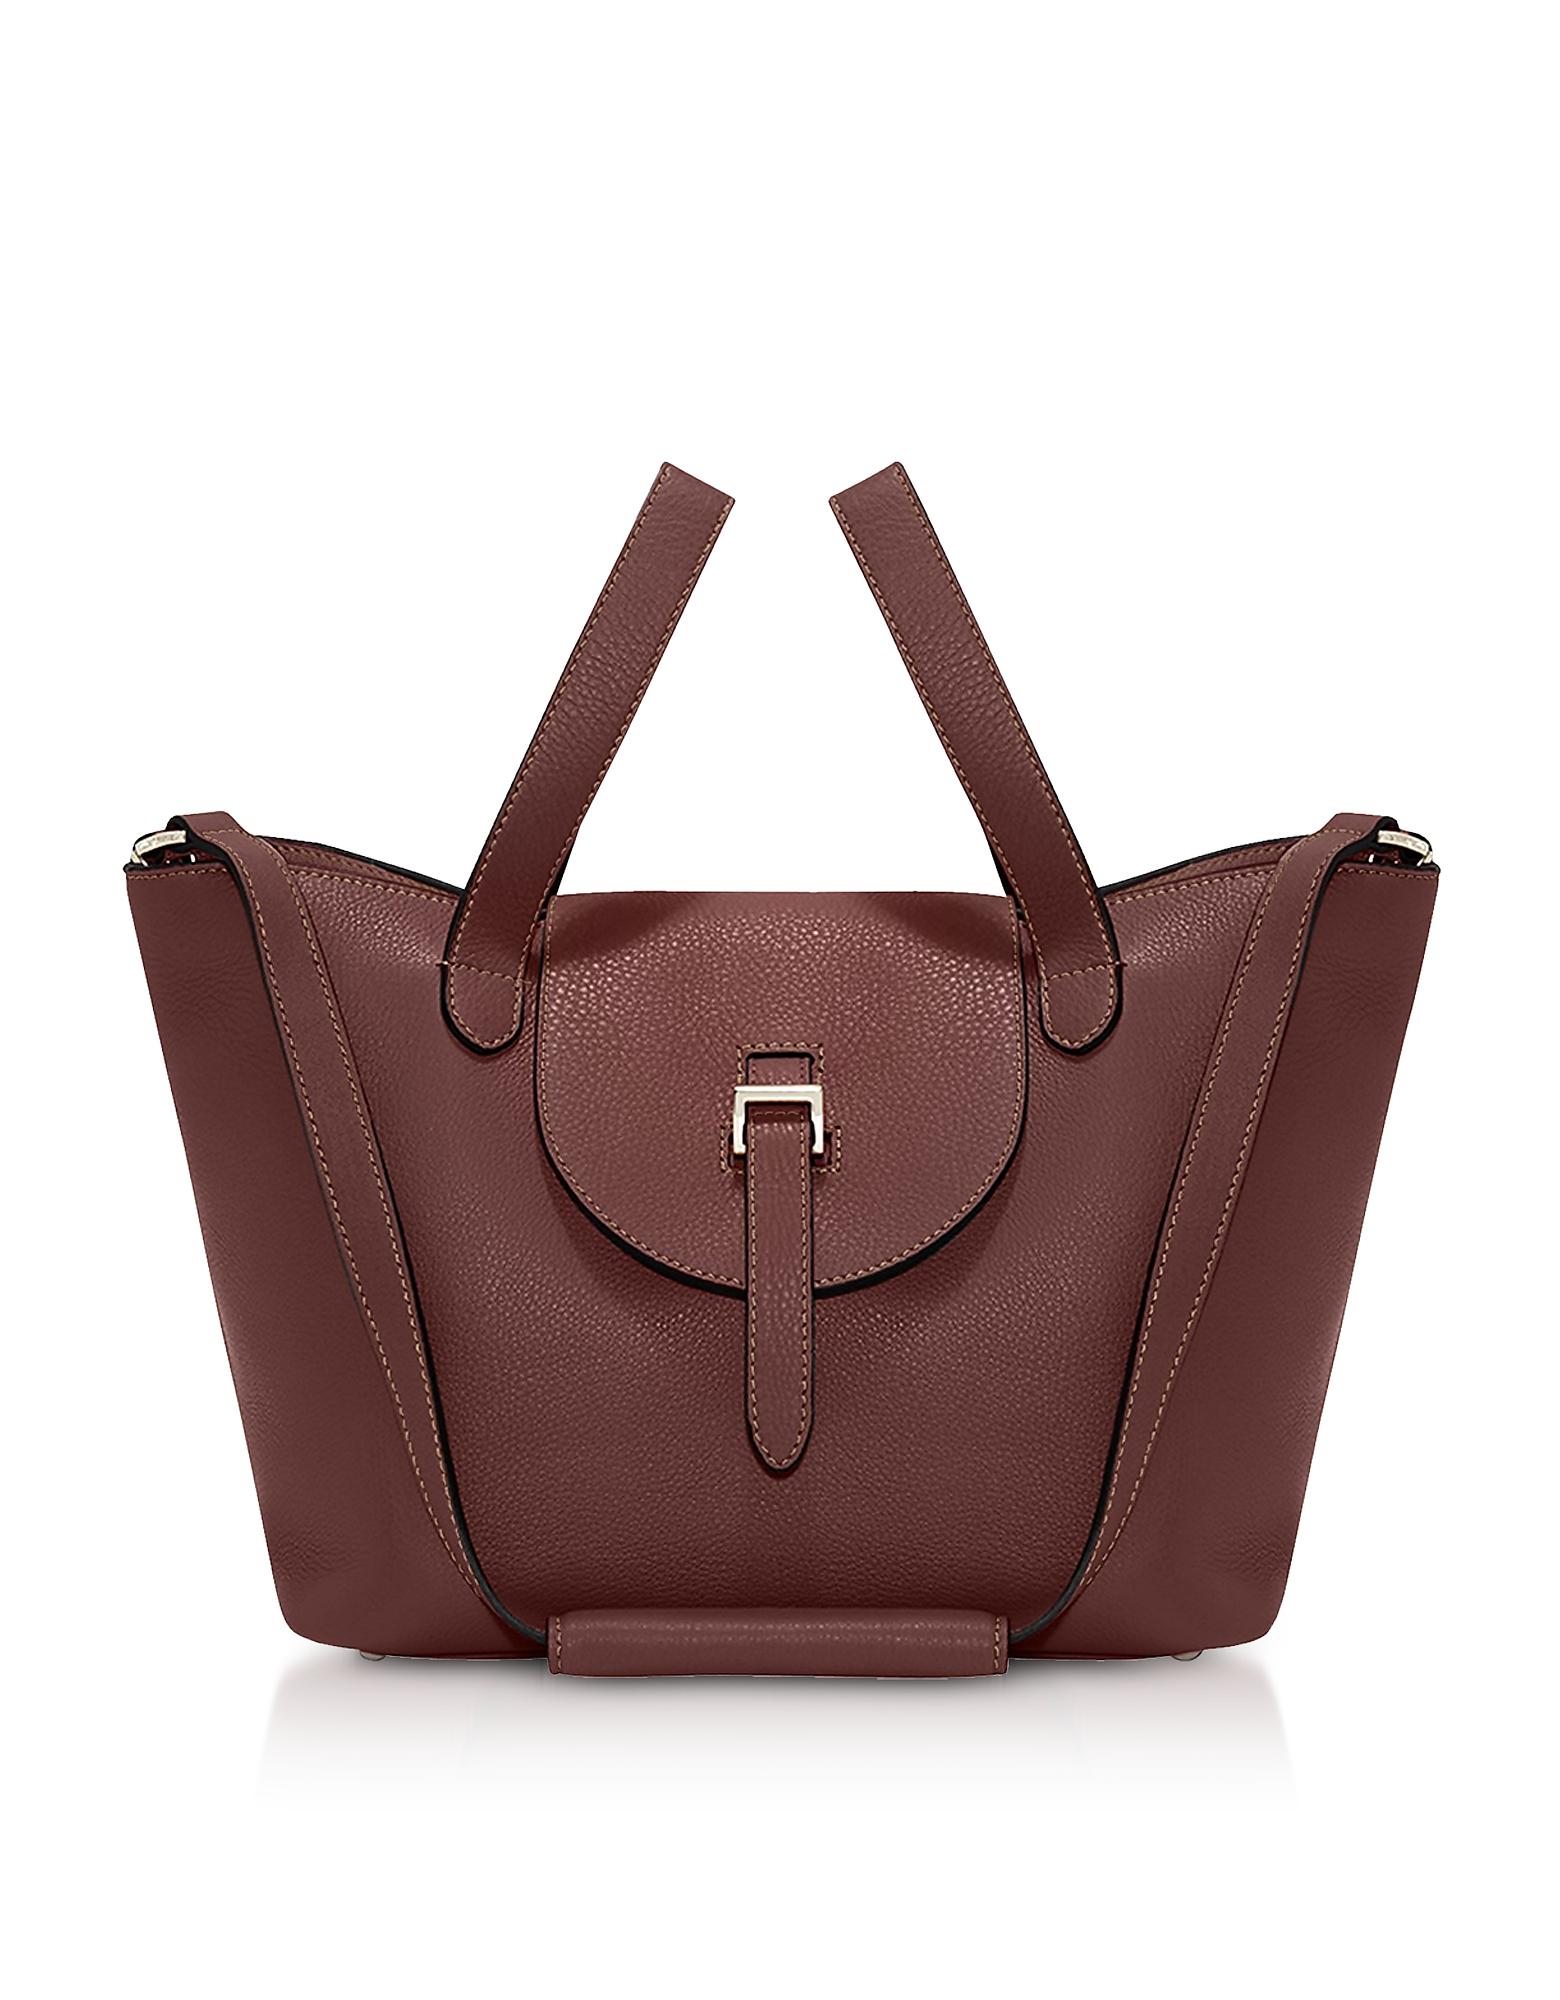 Meli Melo Handbags, Argan Thela Medium Tote Bag